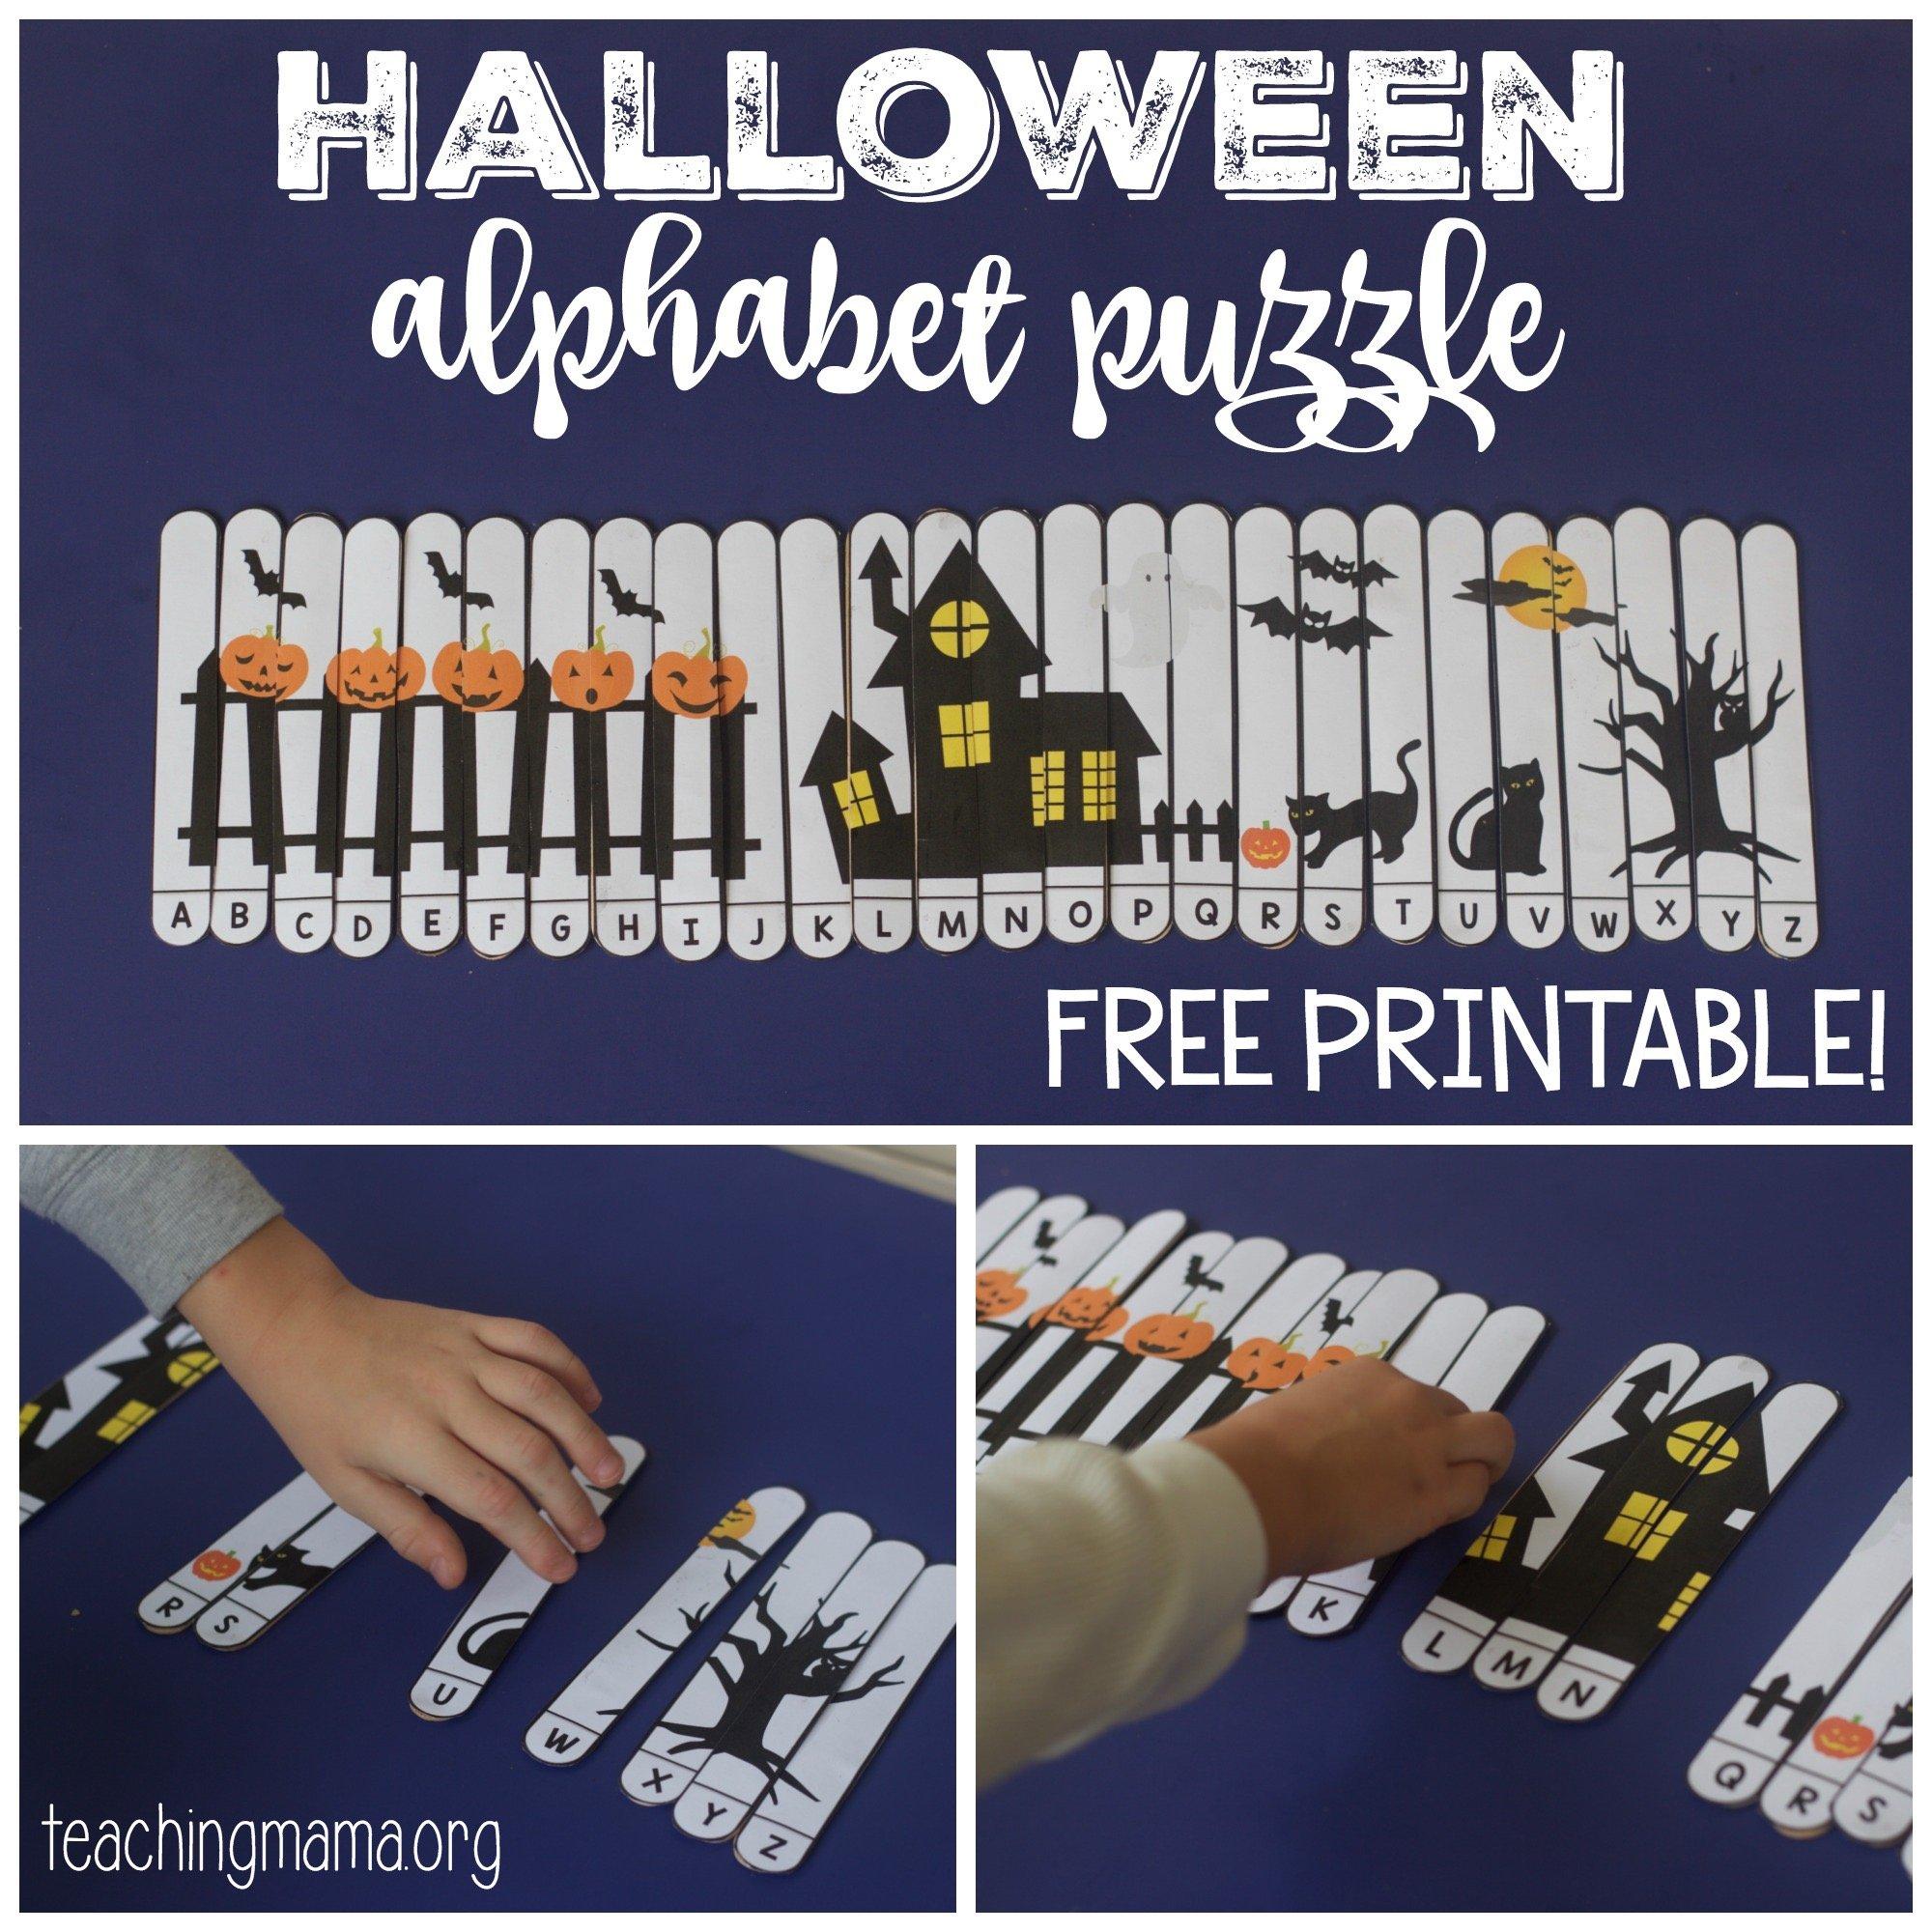 graphic regarding Alphabet Puzzle Printable titled Halloween Alphabet Puzzle